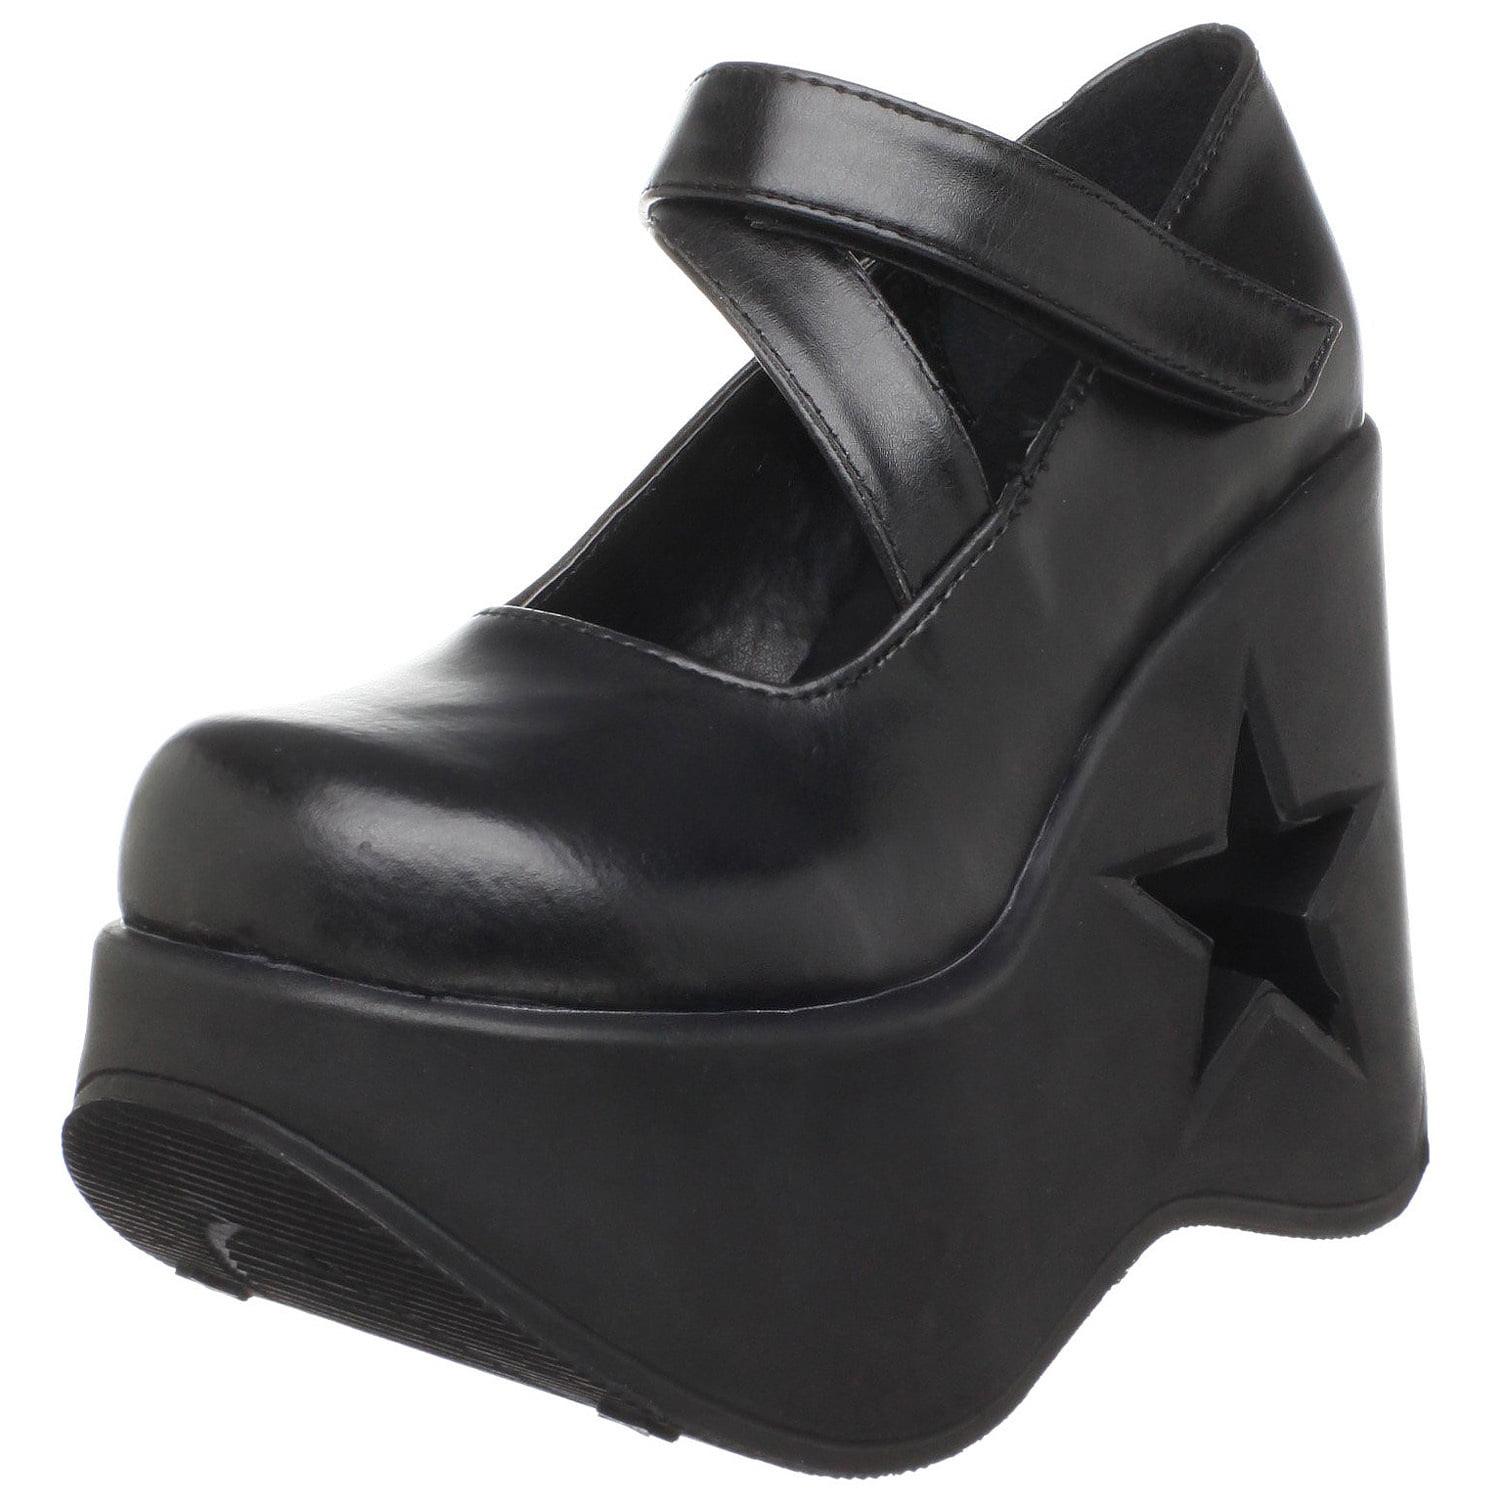 Trendy Goth 5 1 4 Inch Lift Shoe Star Cutout Platform Black Demonia by